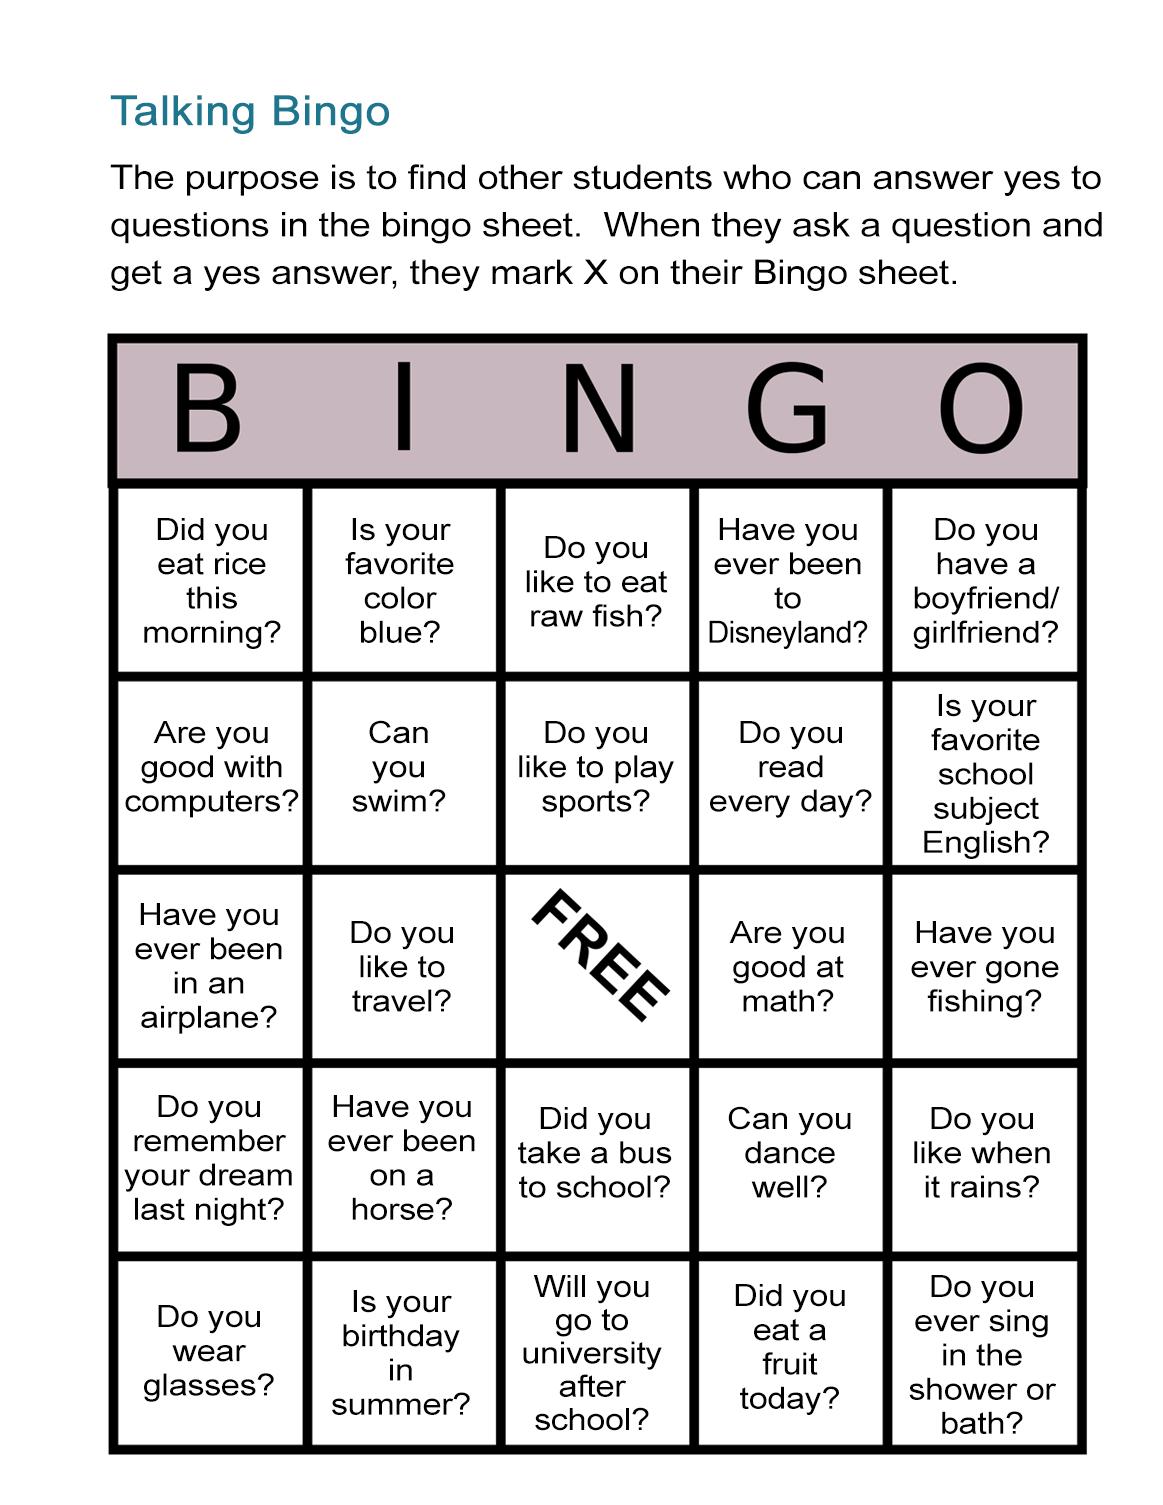 Esl Bingo Free Worksheet: Stand-Up Bingo - All Esl